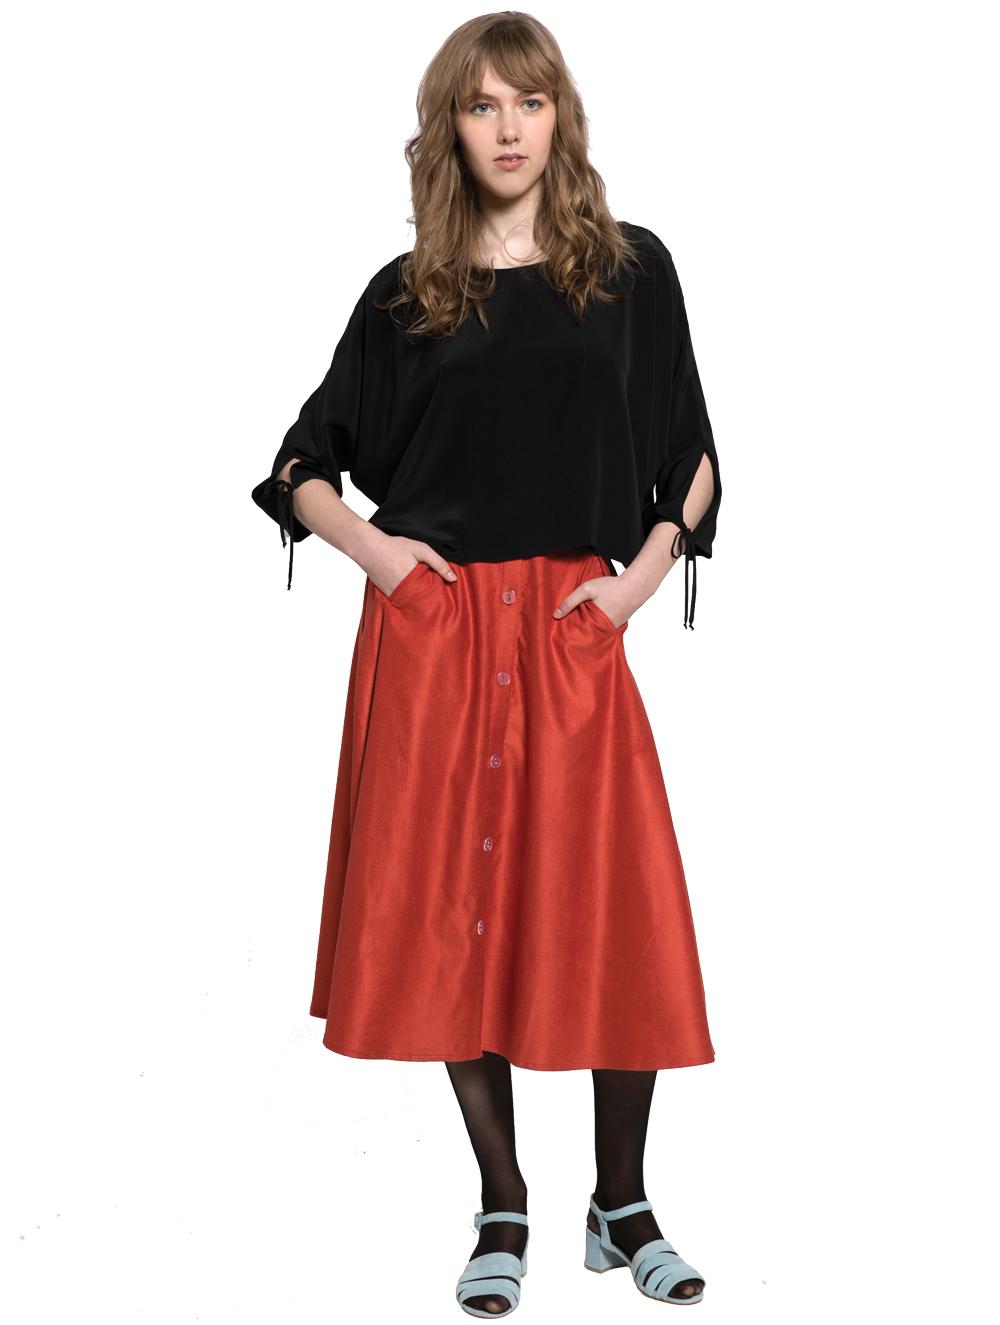 Megan Huntz Selena blouse